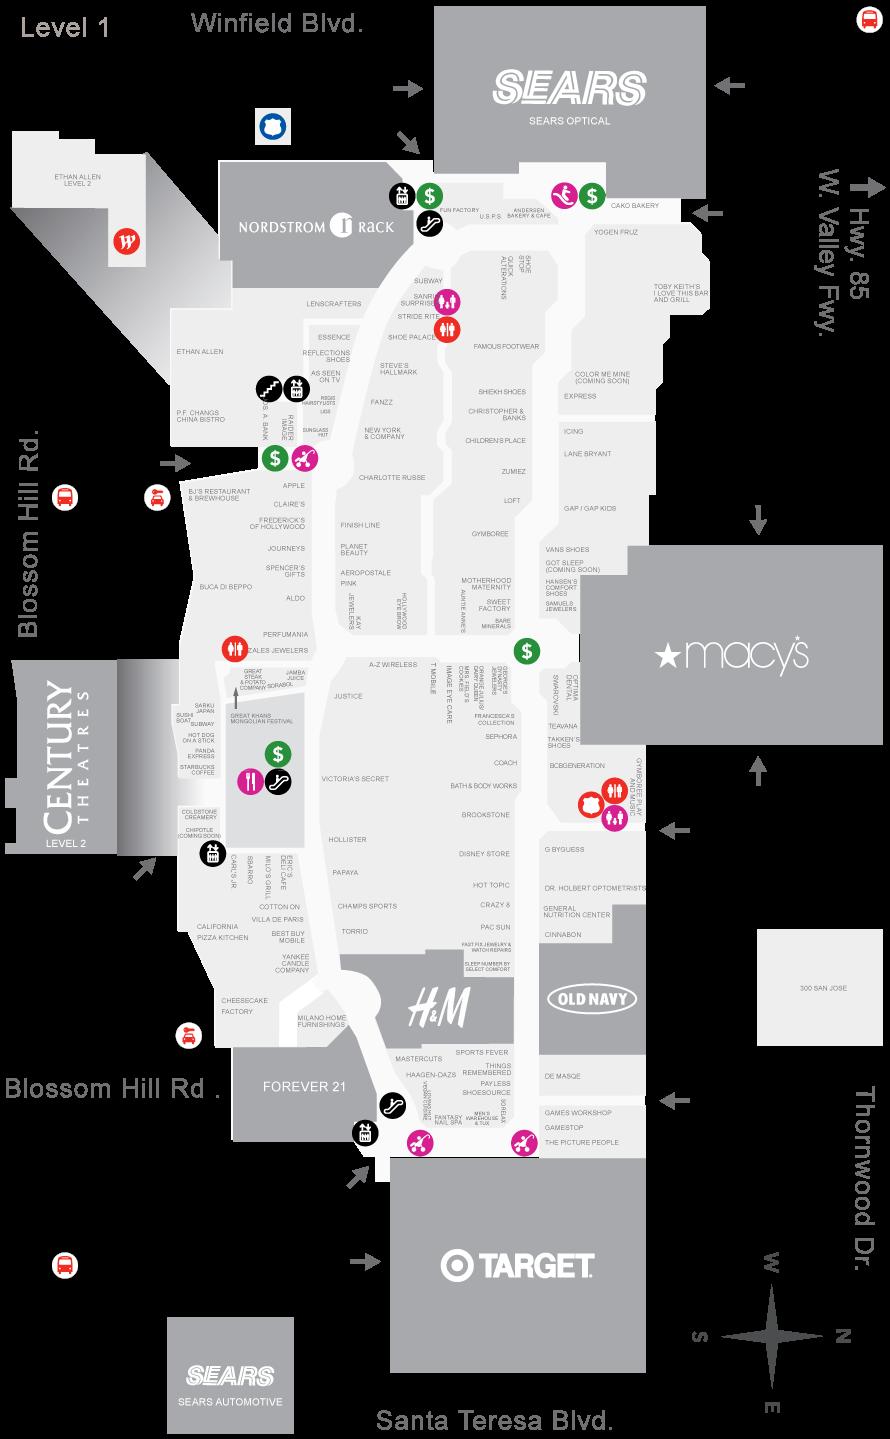 oakridge centre mall map  My blog